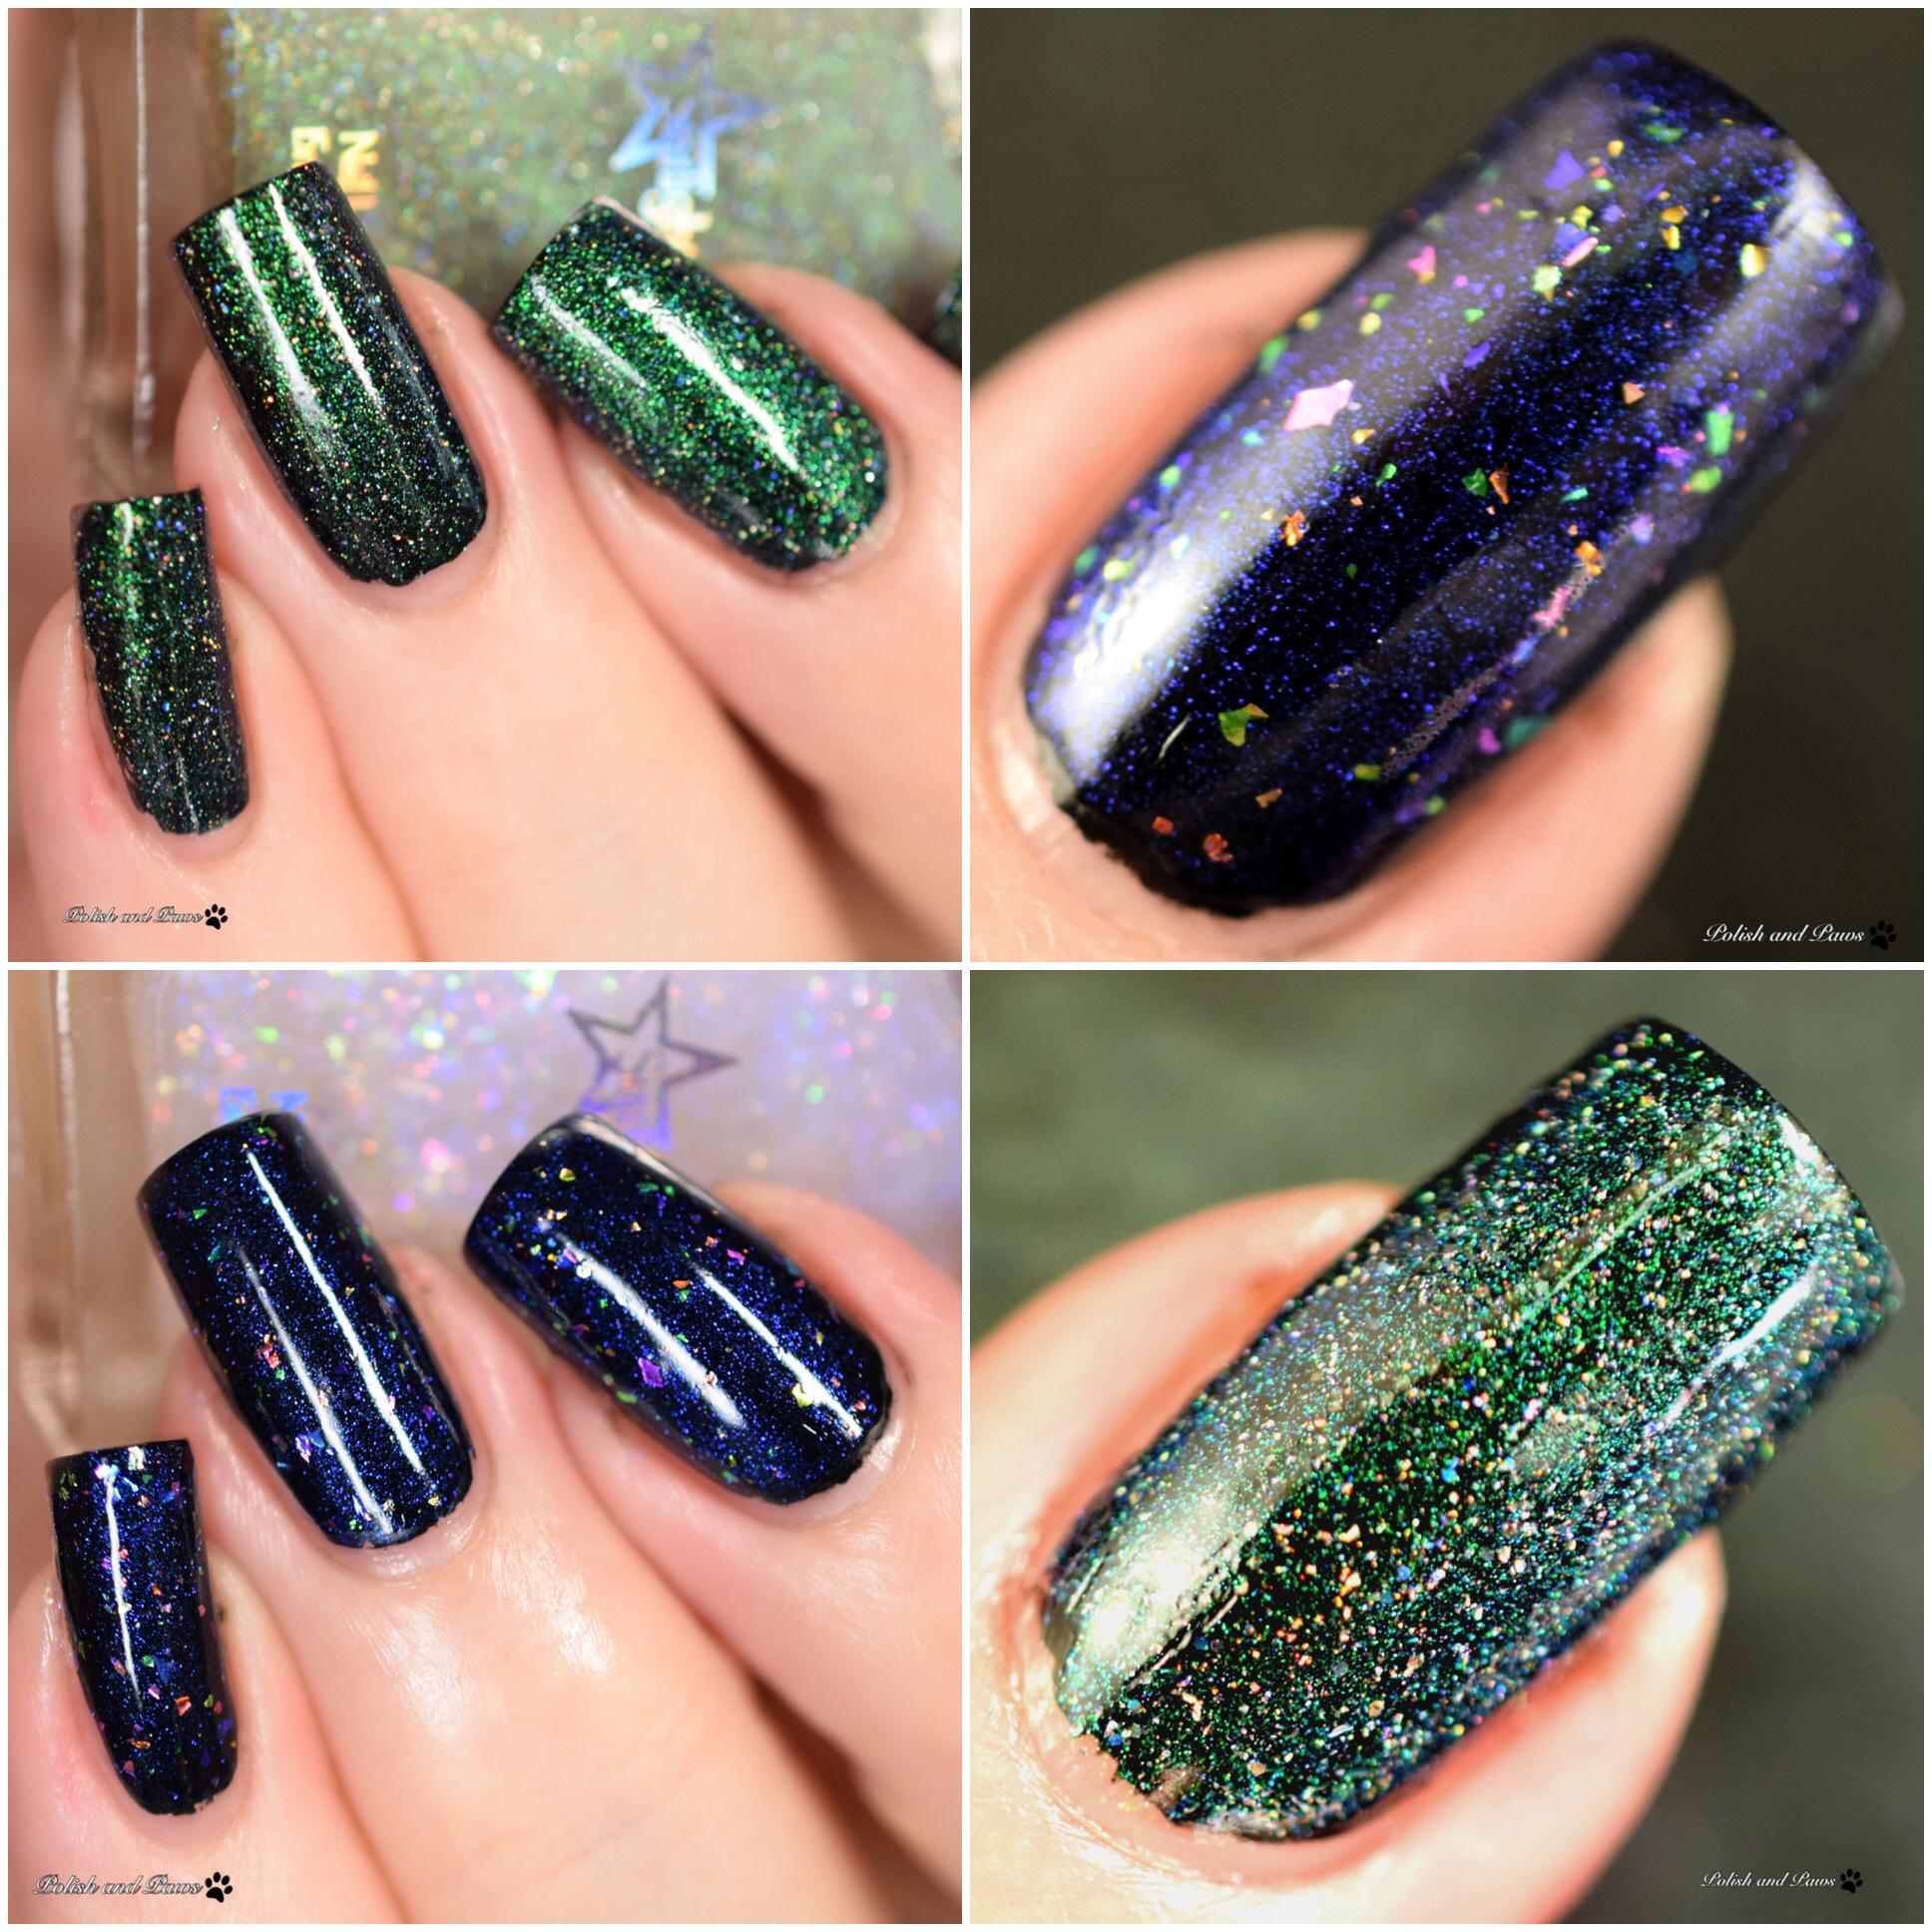 Starlight Polish Sea Sapphires - Myths, Magic, and Wonders April PPU